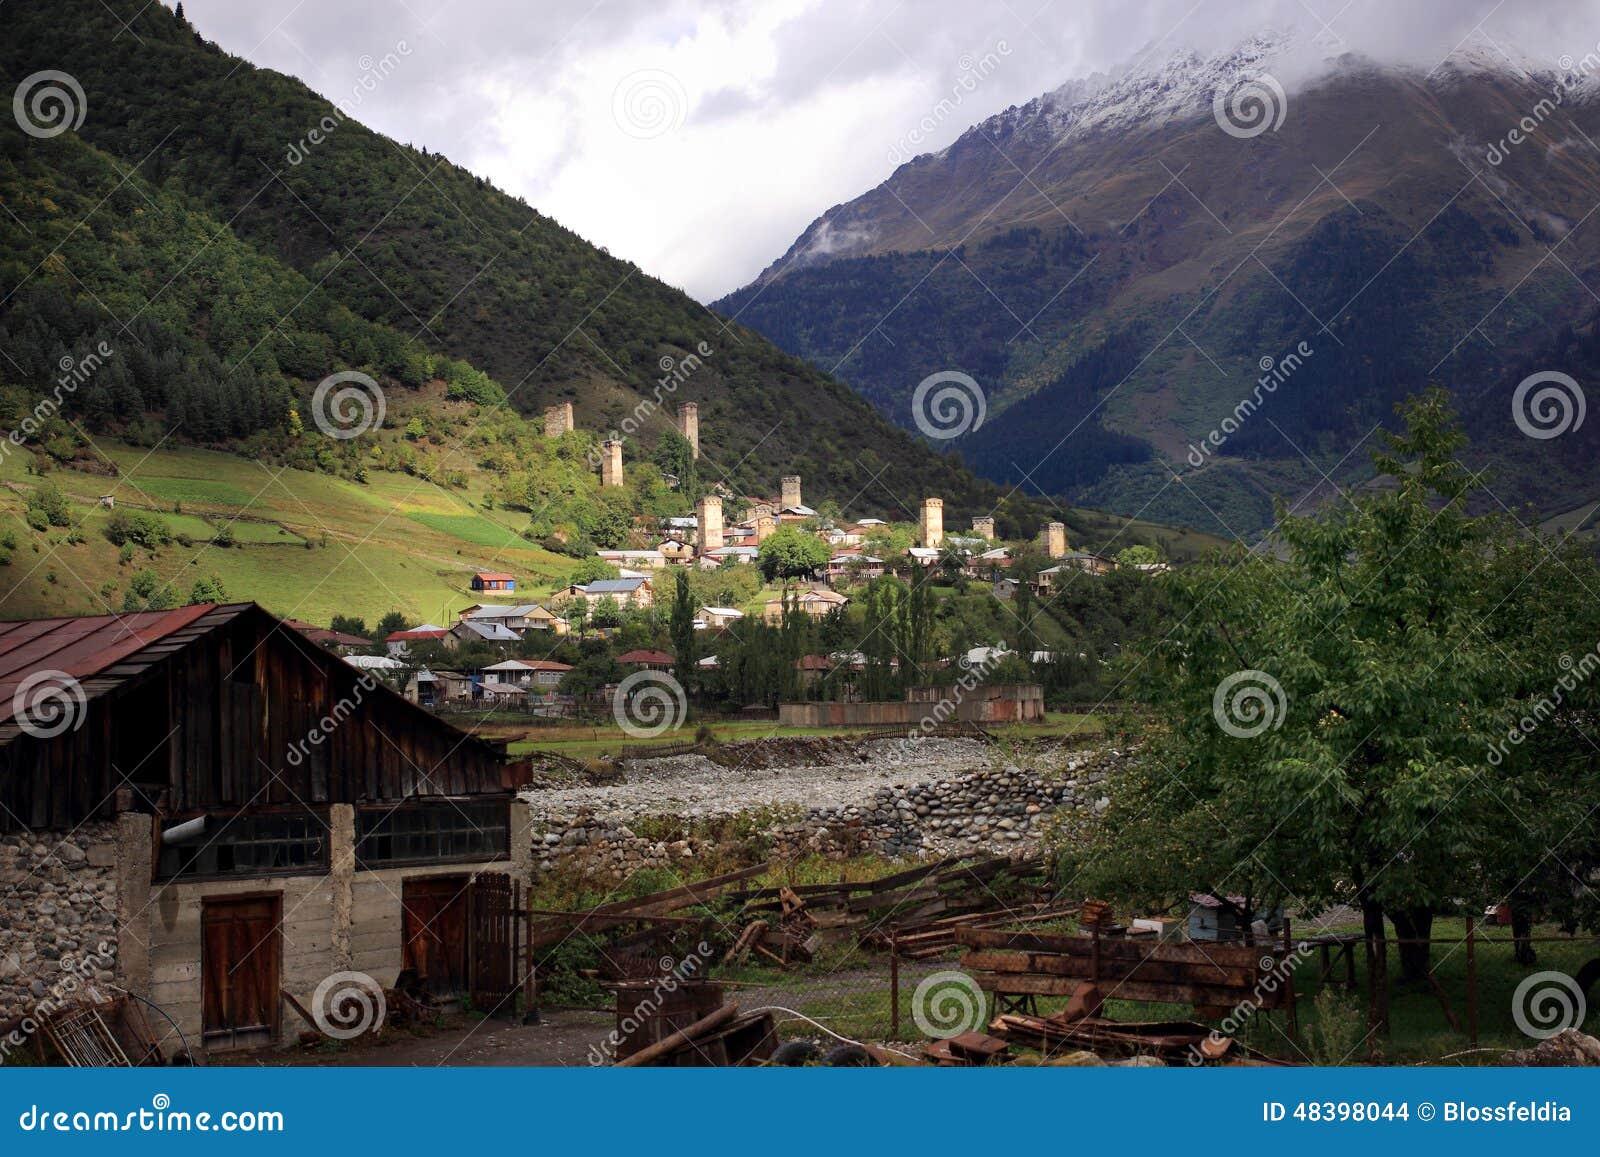 Mestia city stock photo  Image of cultural, region, mountains - 48398044